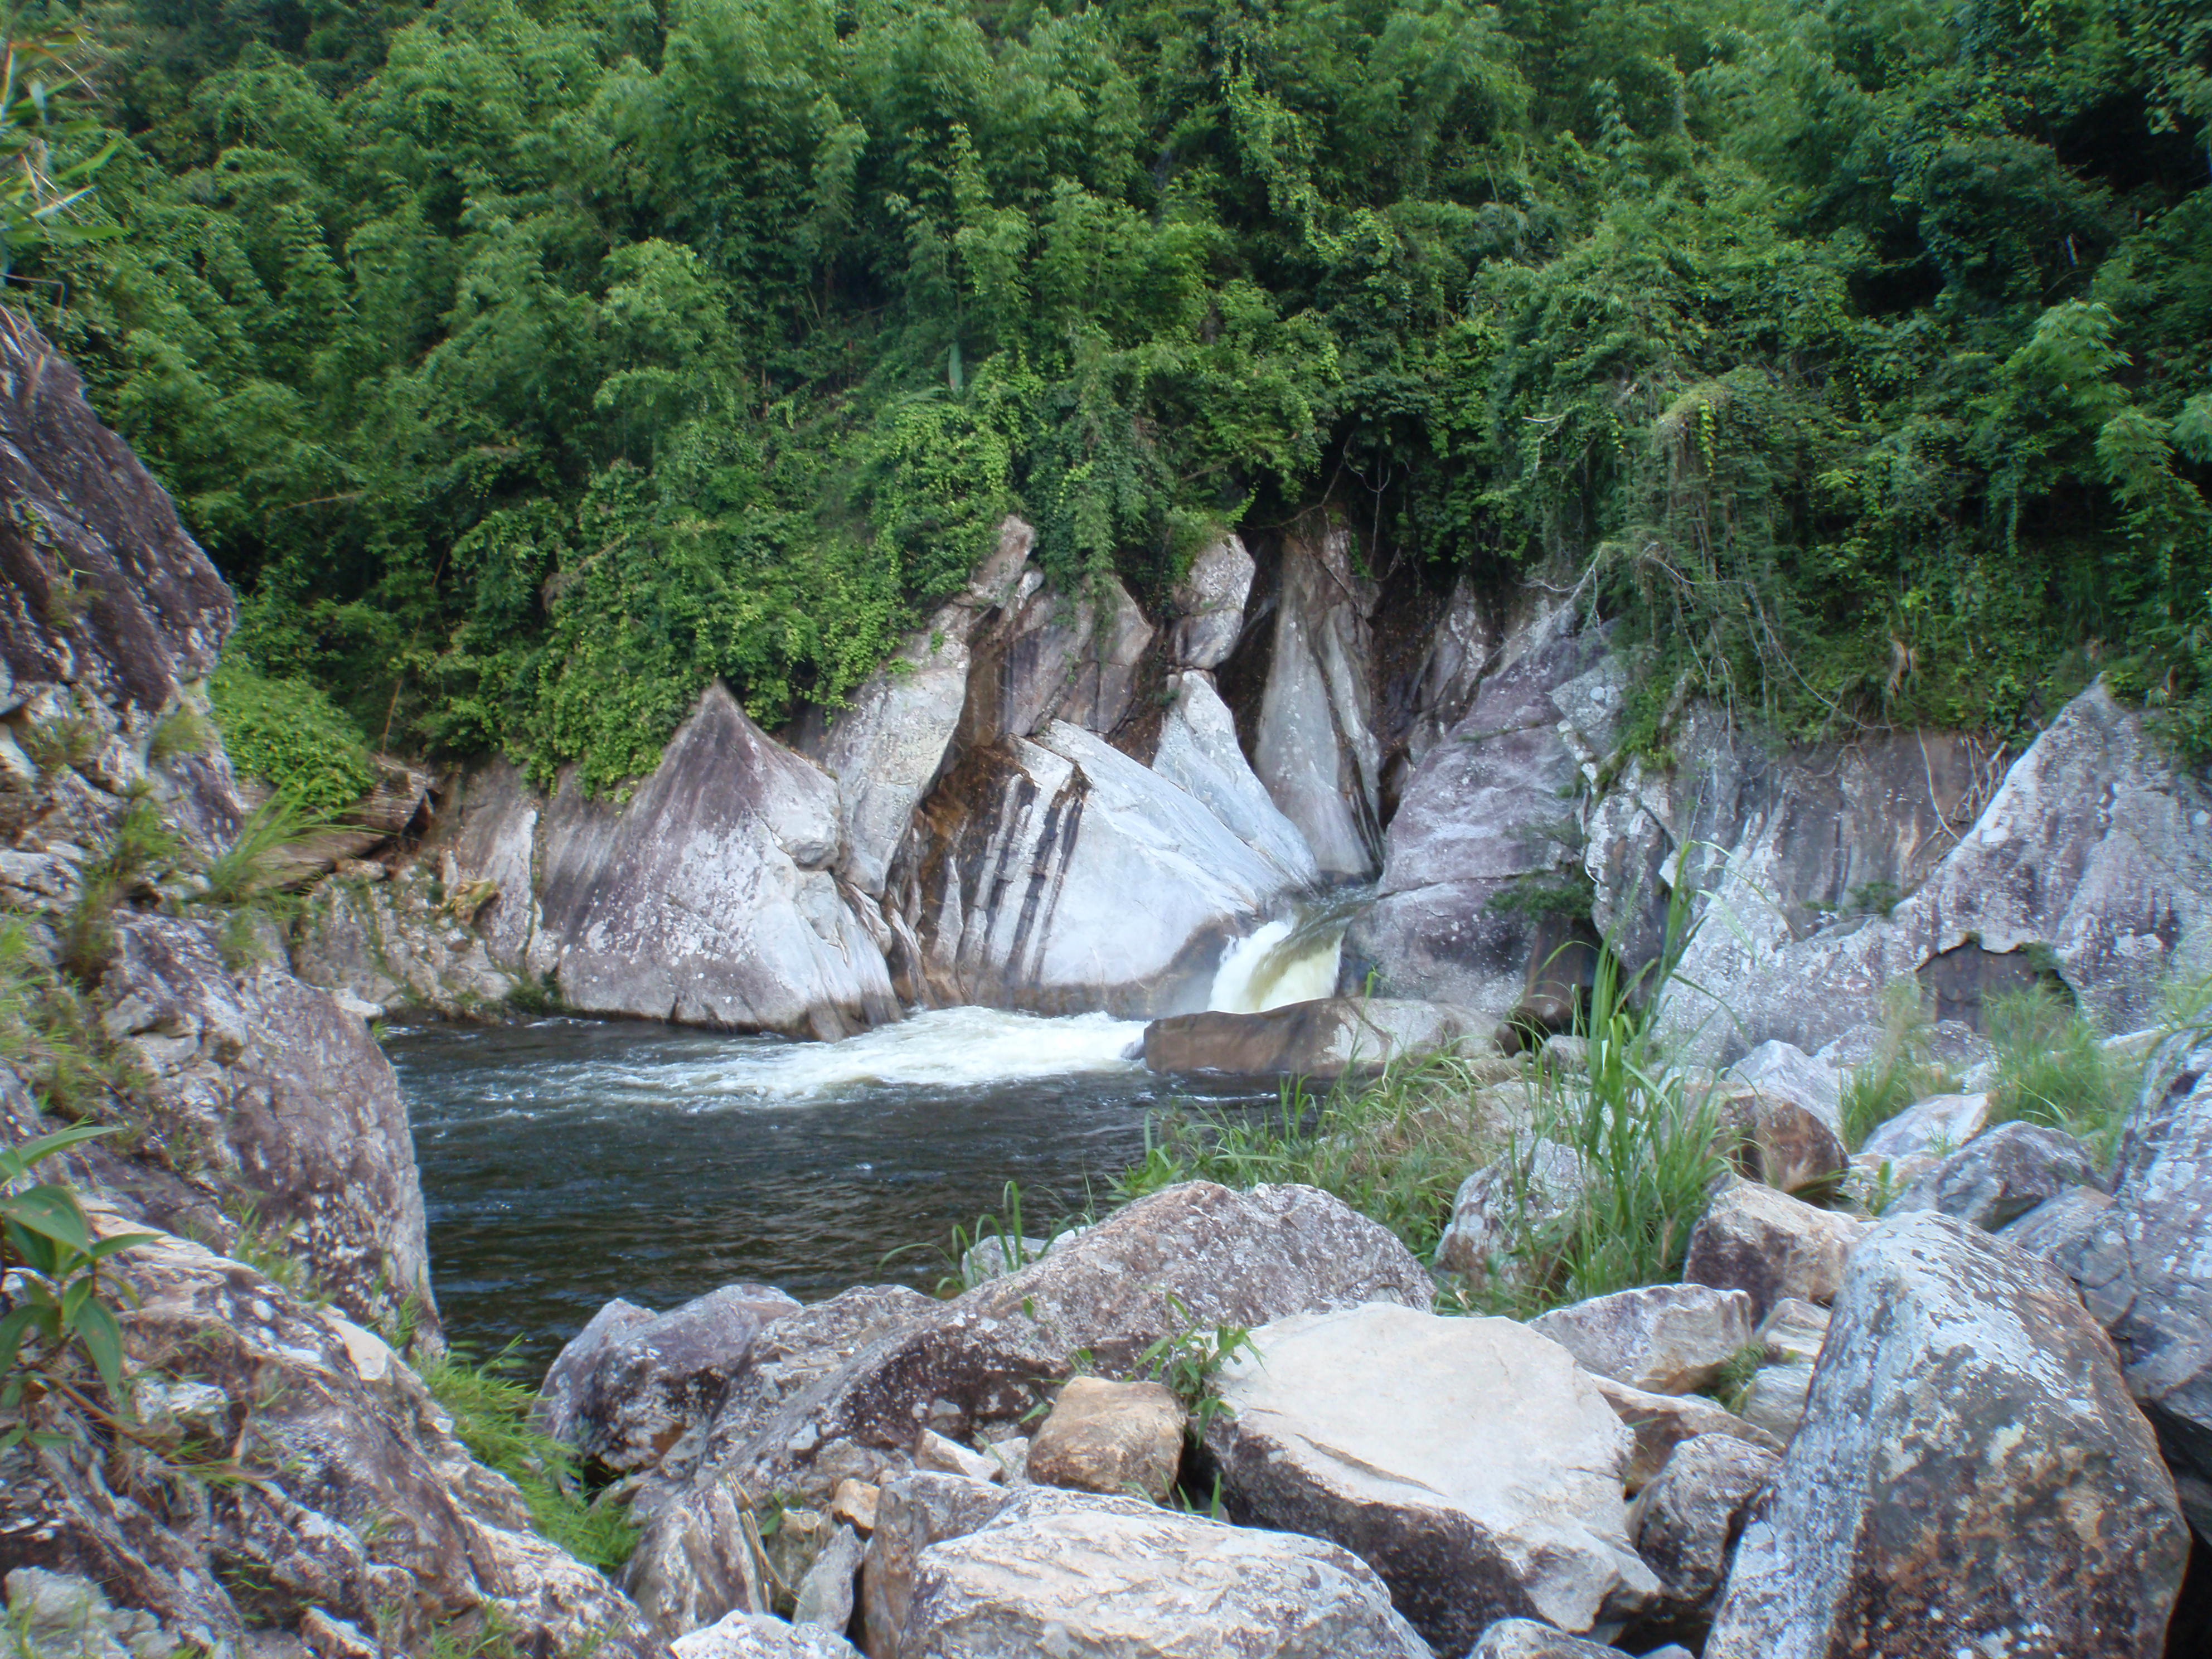 Waterfall. refreshing near the end o